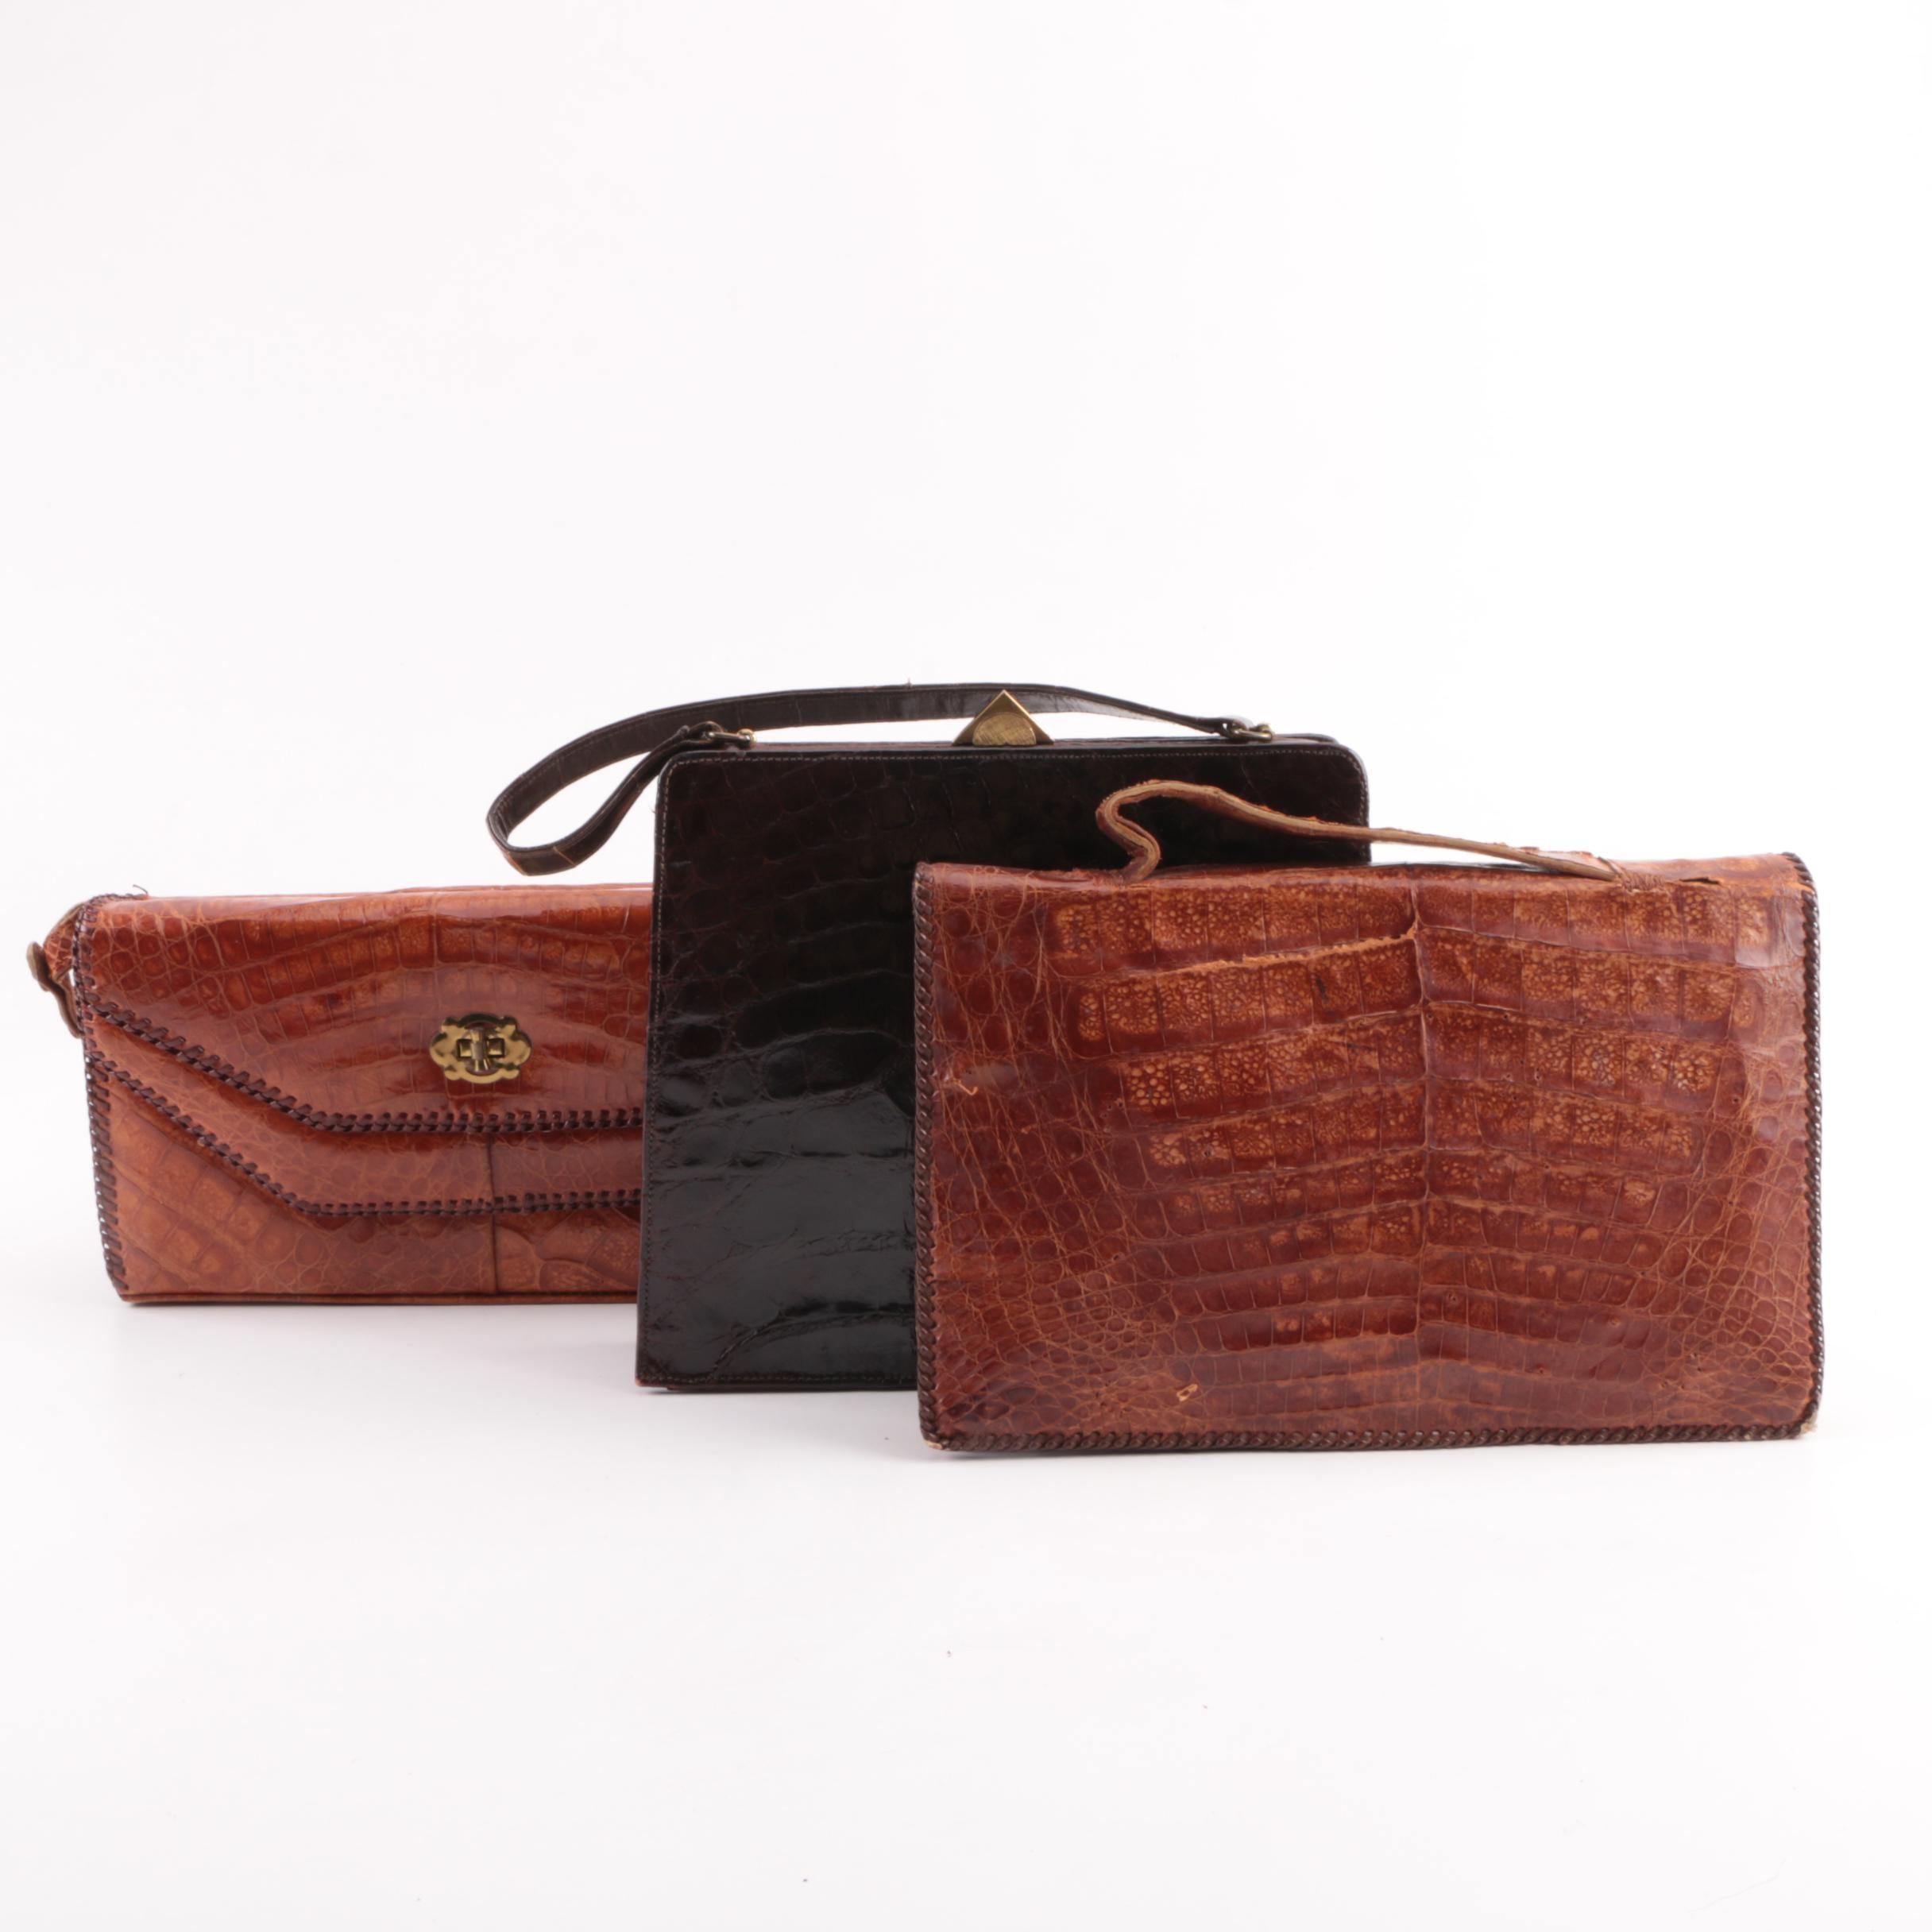 Vintage Caiman and Alligator Handbags